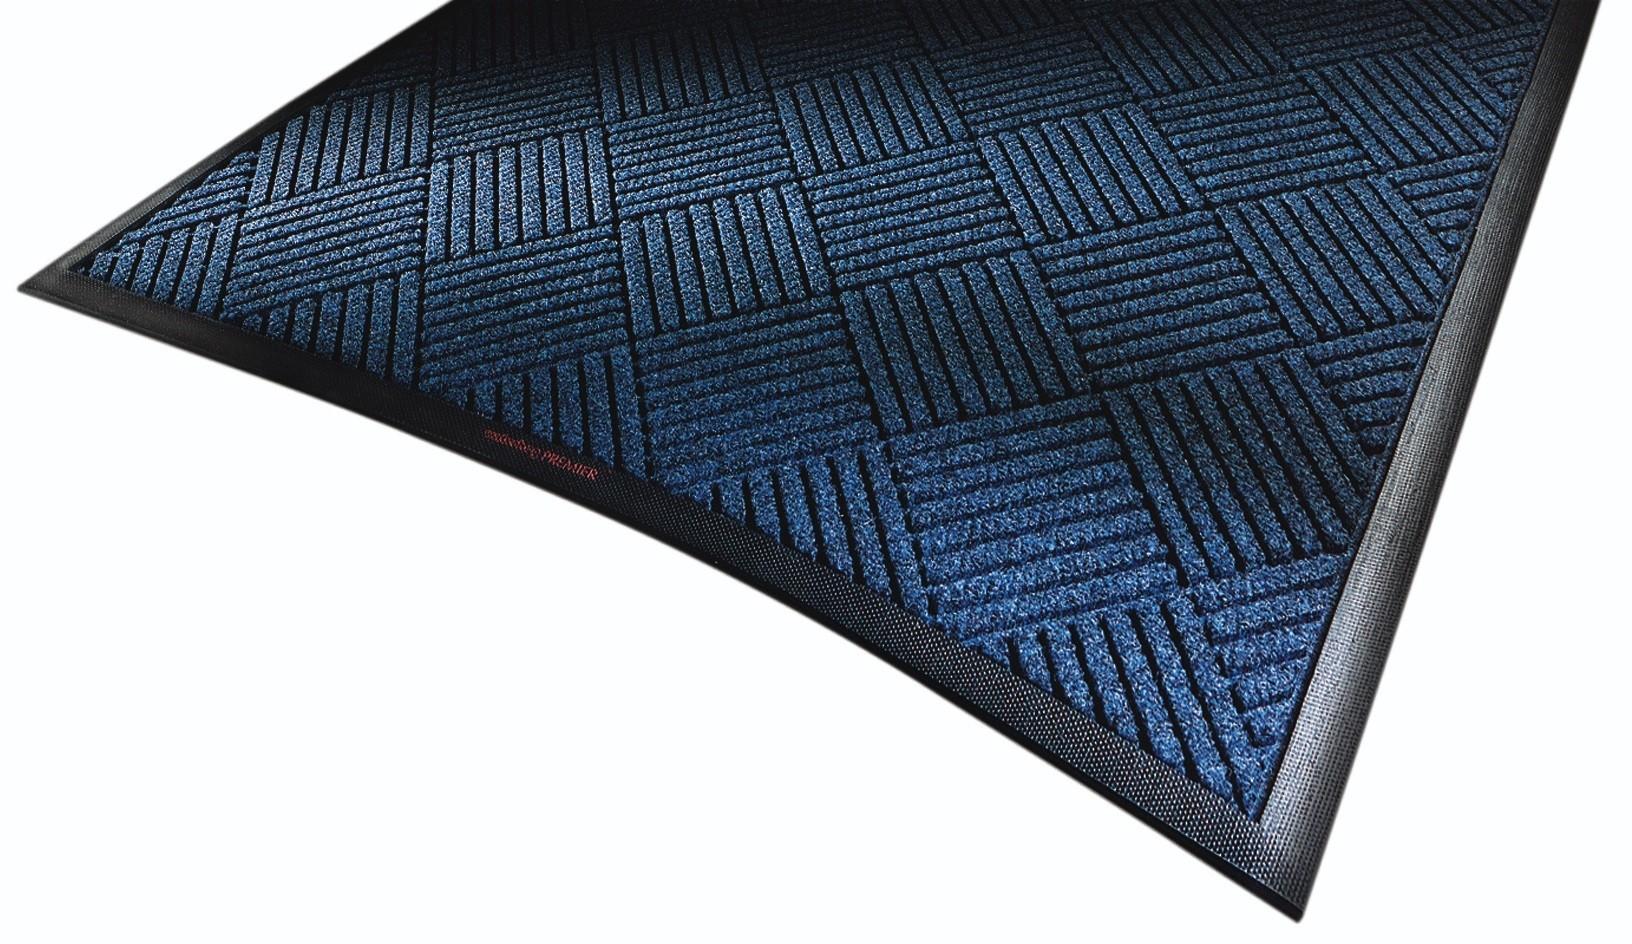 Waterhog Eco Premier Floor Mat Systems